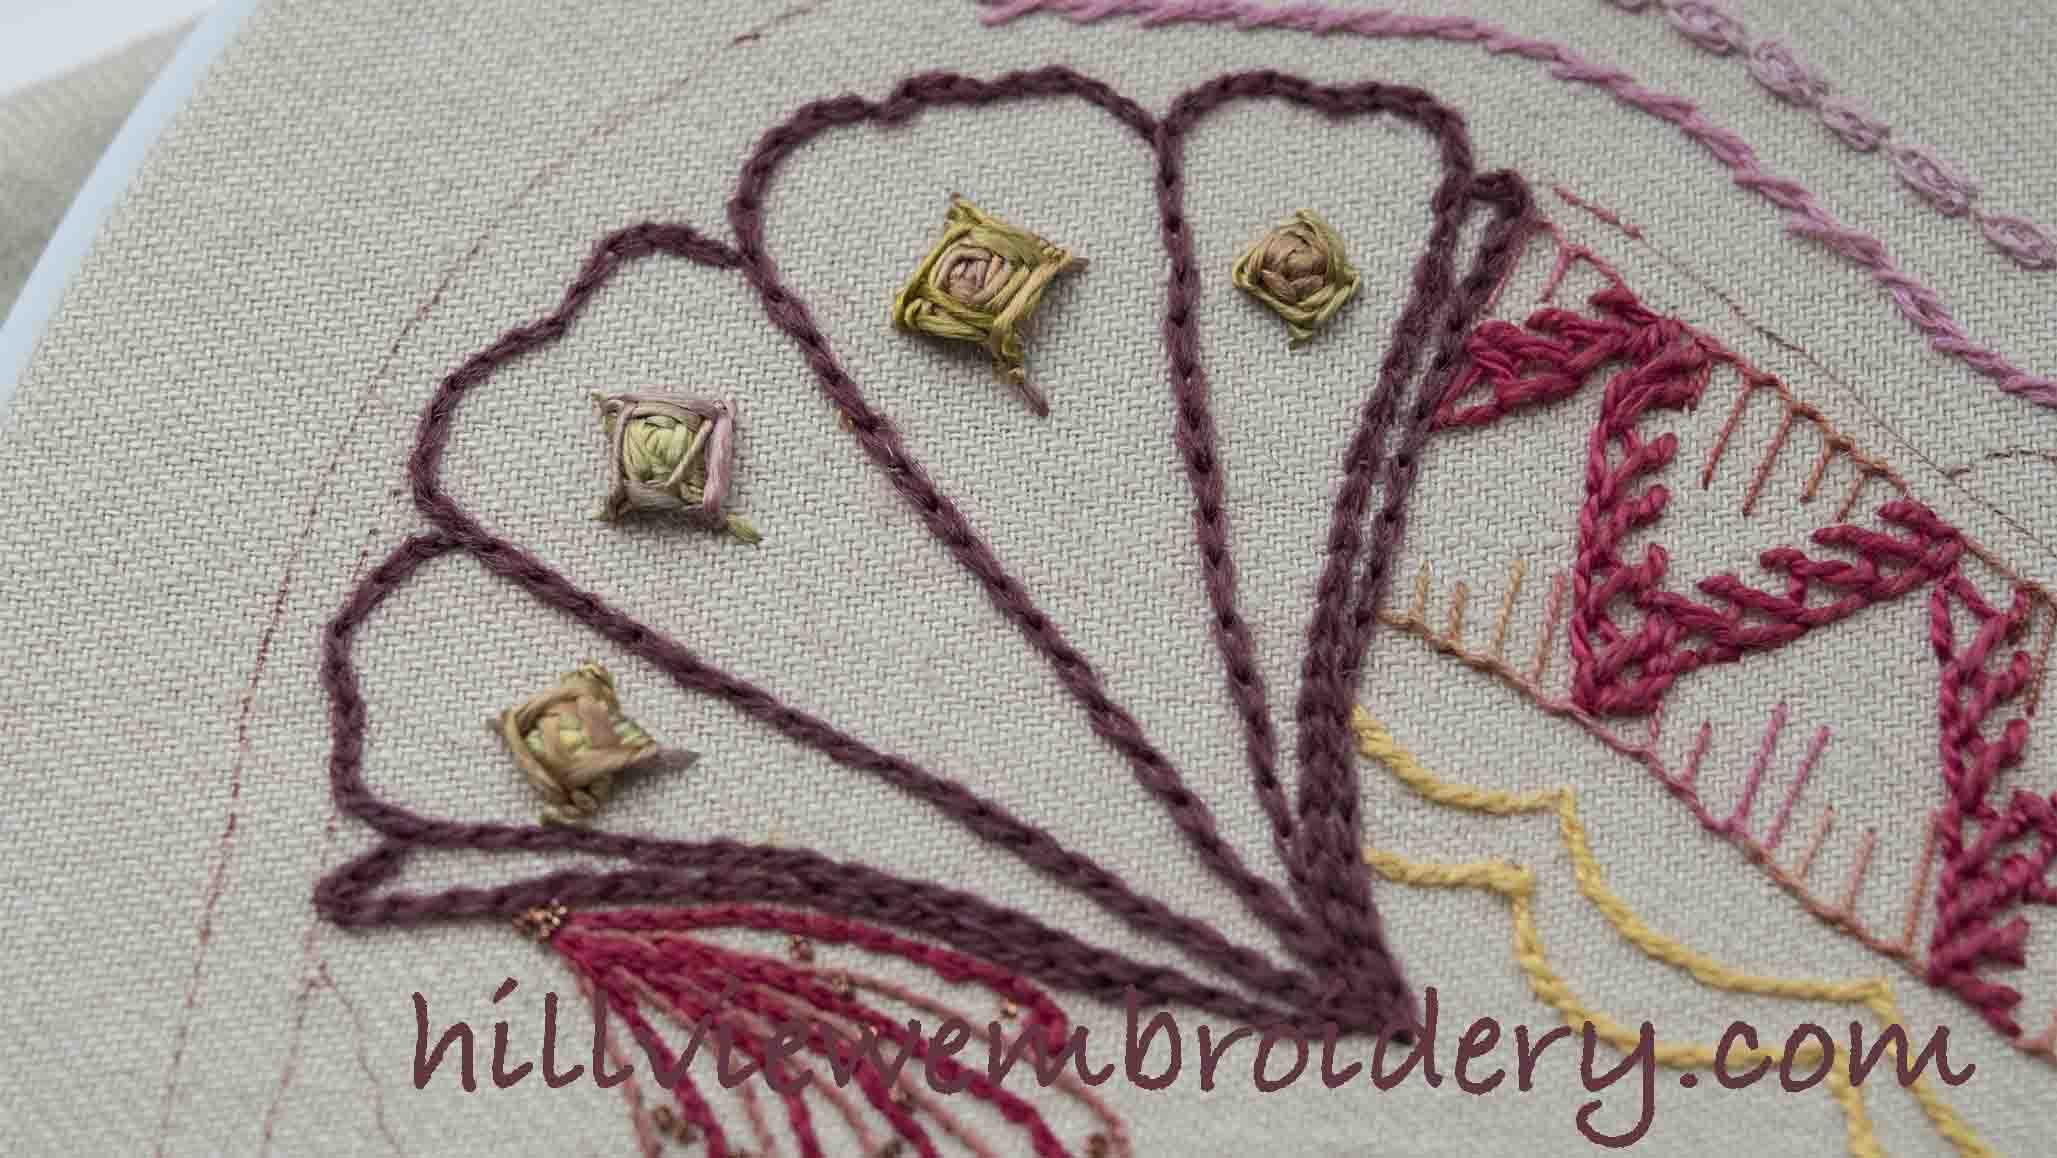 chain stitch worked in wool